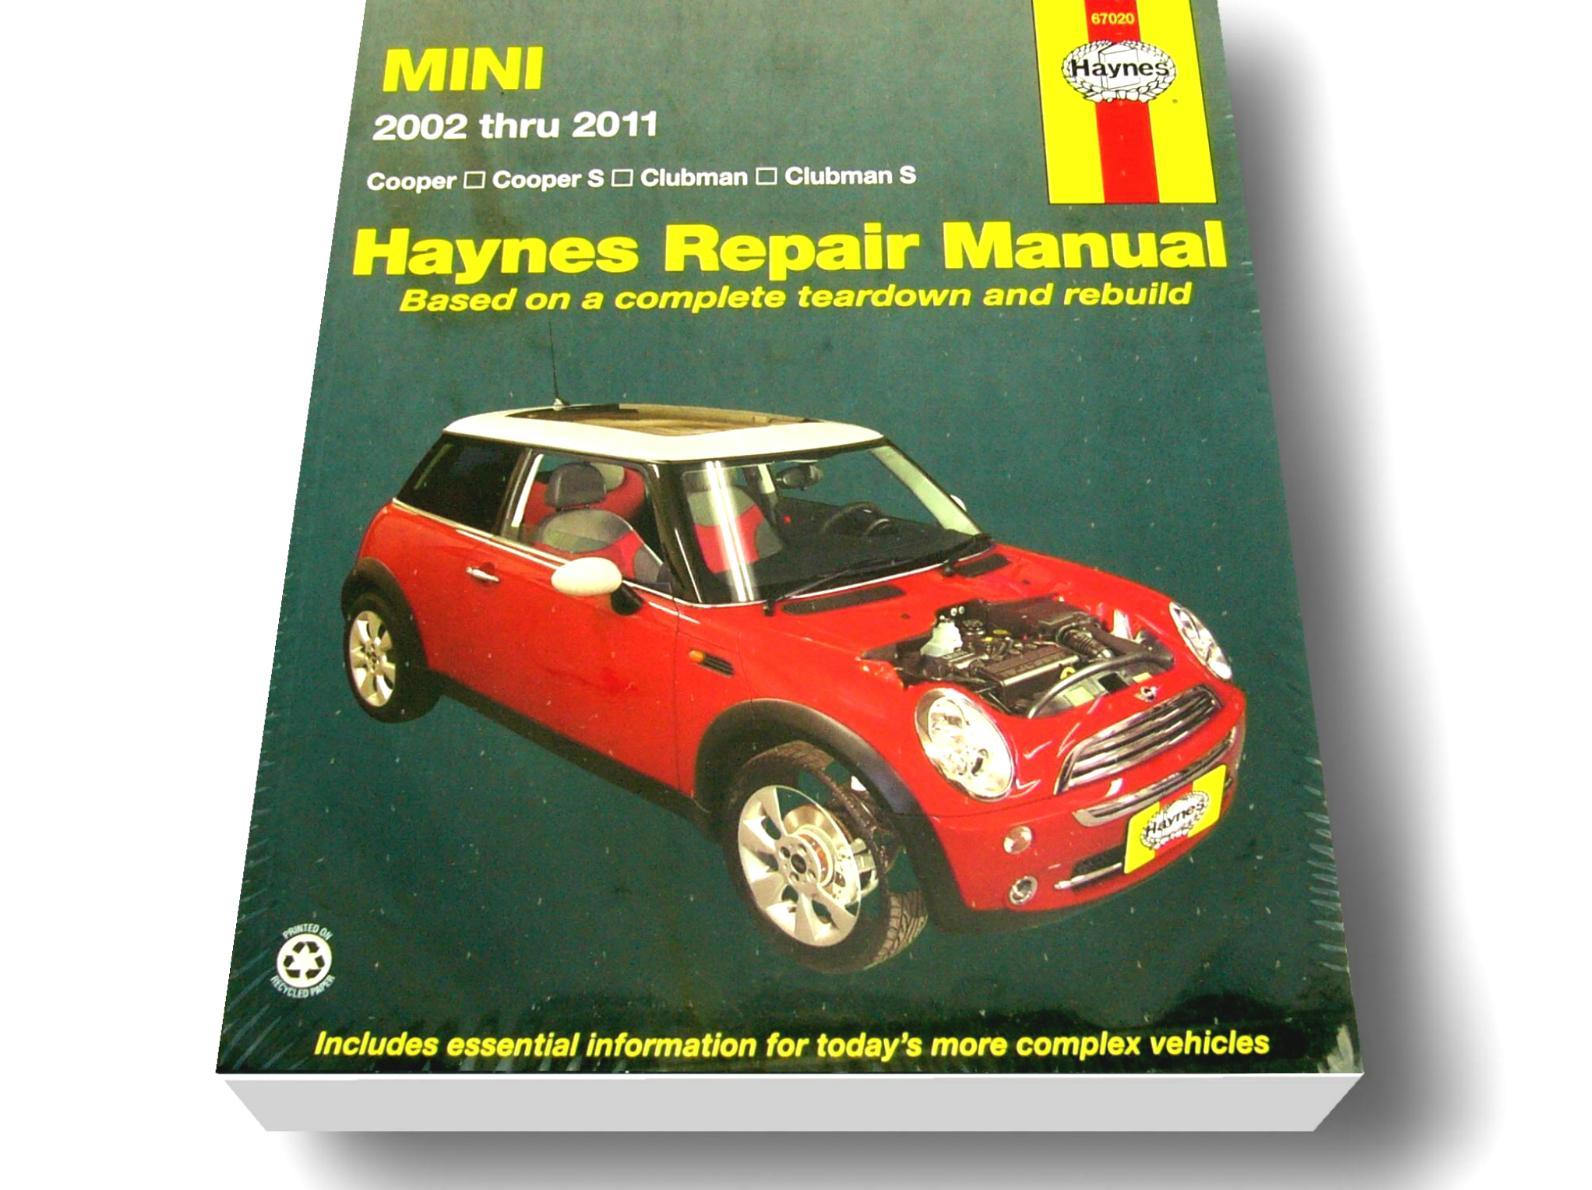 Auto & Motorrad: Teile Auto-Ersatz- & -Reparaturteile MANN-FILTER ...